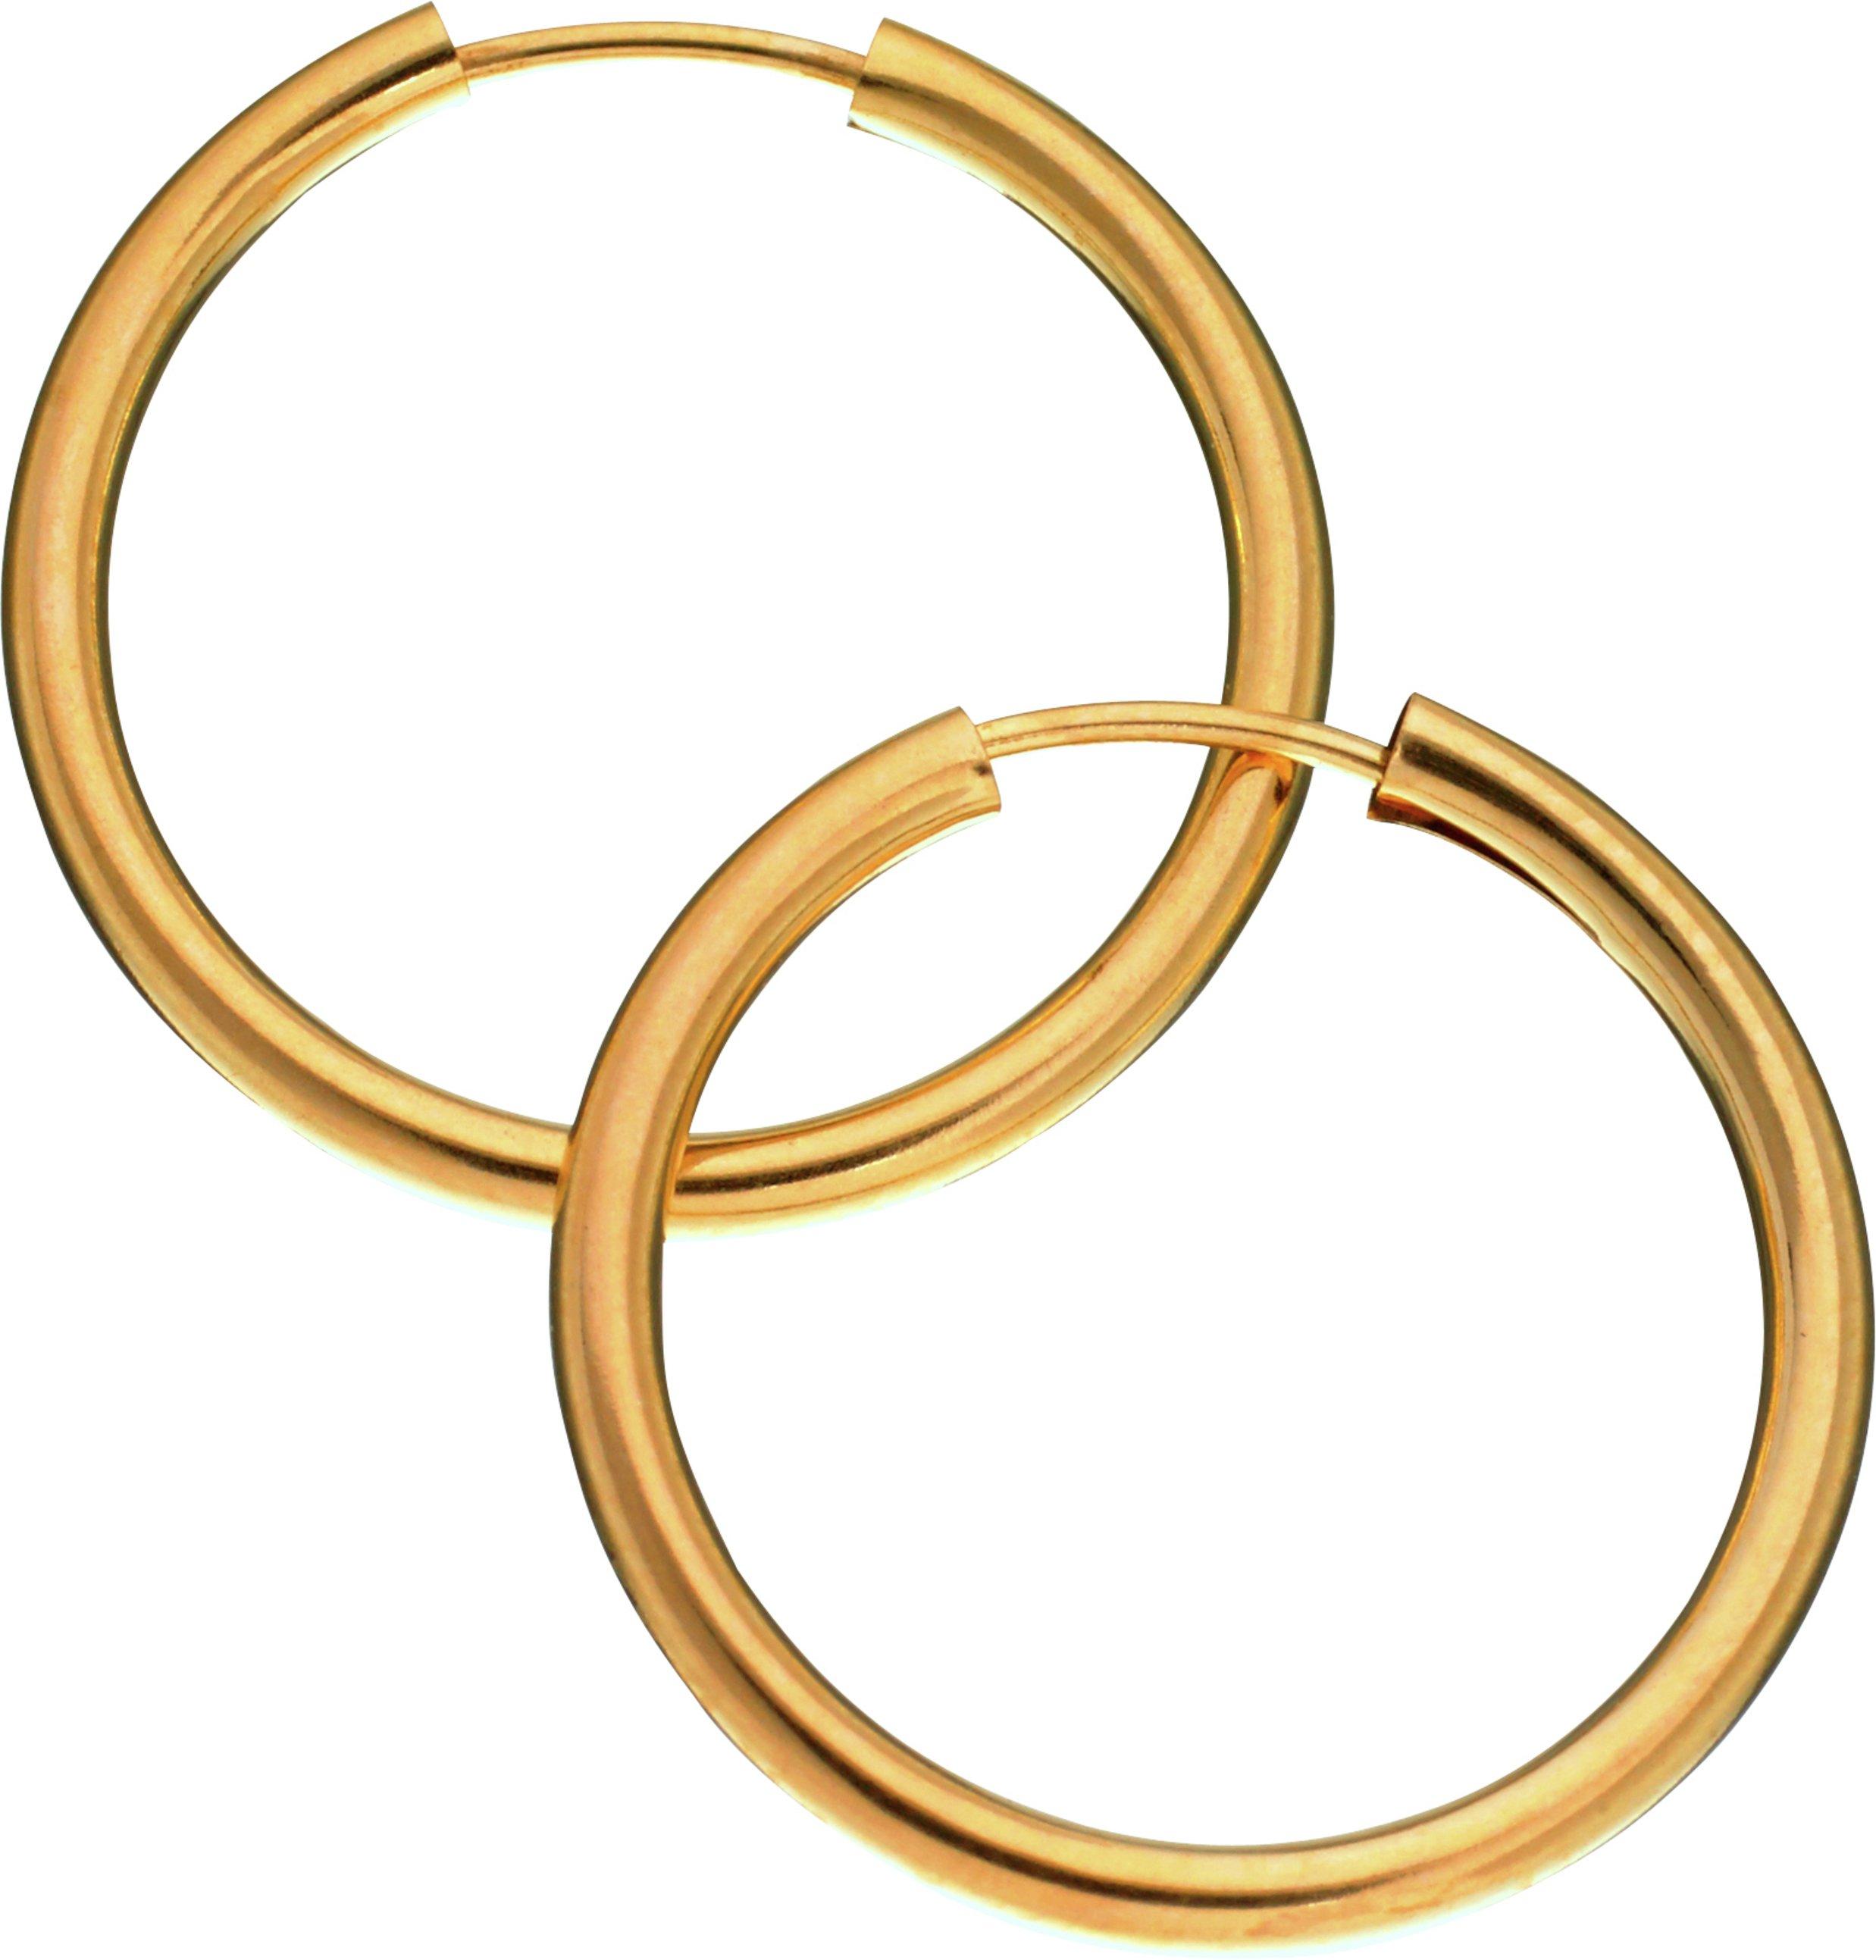 Buy Revere 9ct Gold Hoop Earrings at Argos Your line